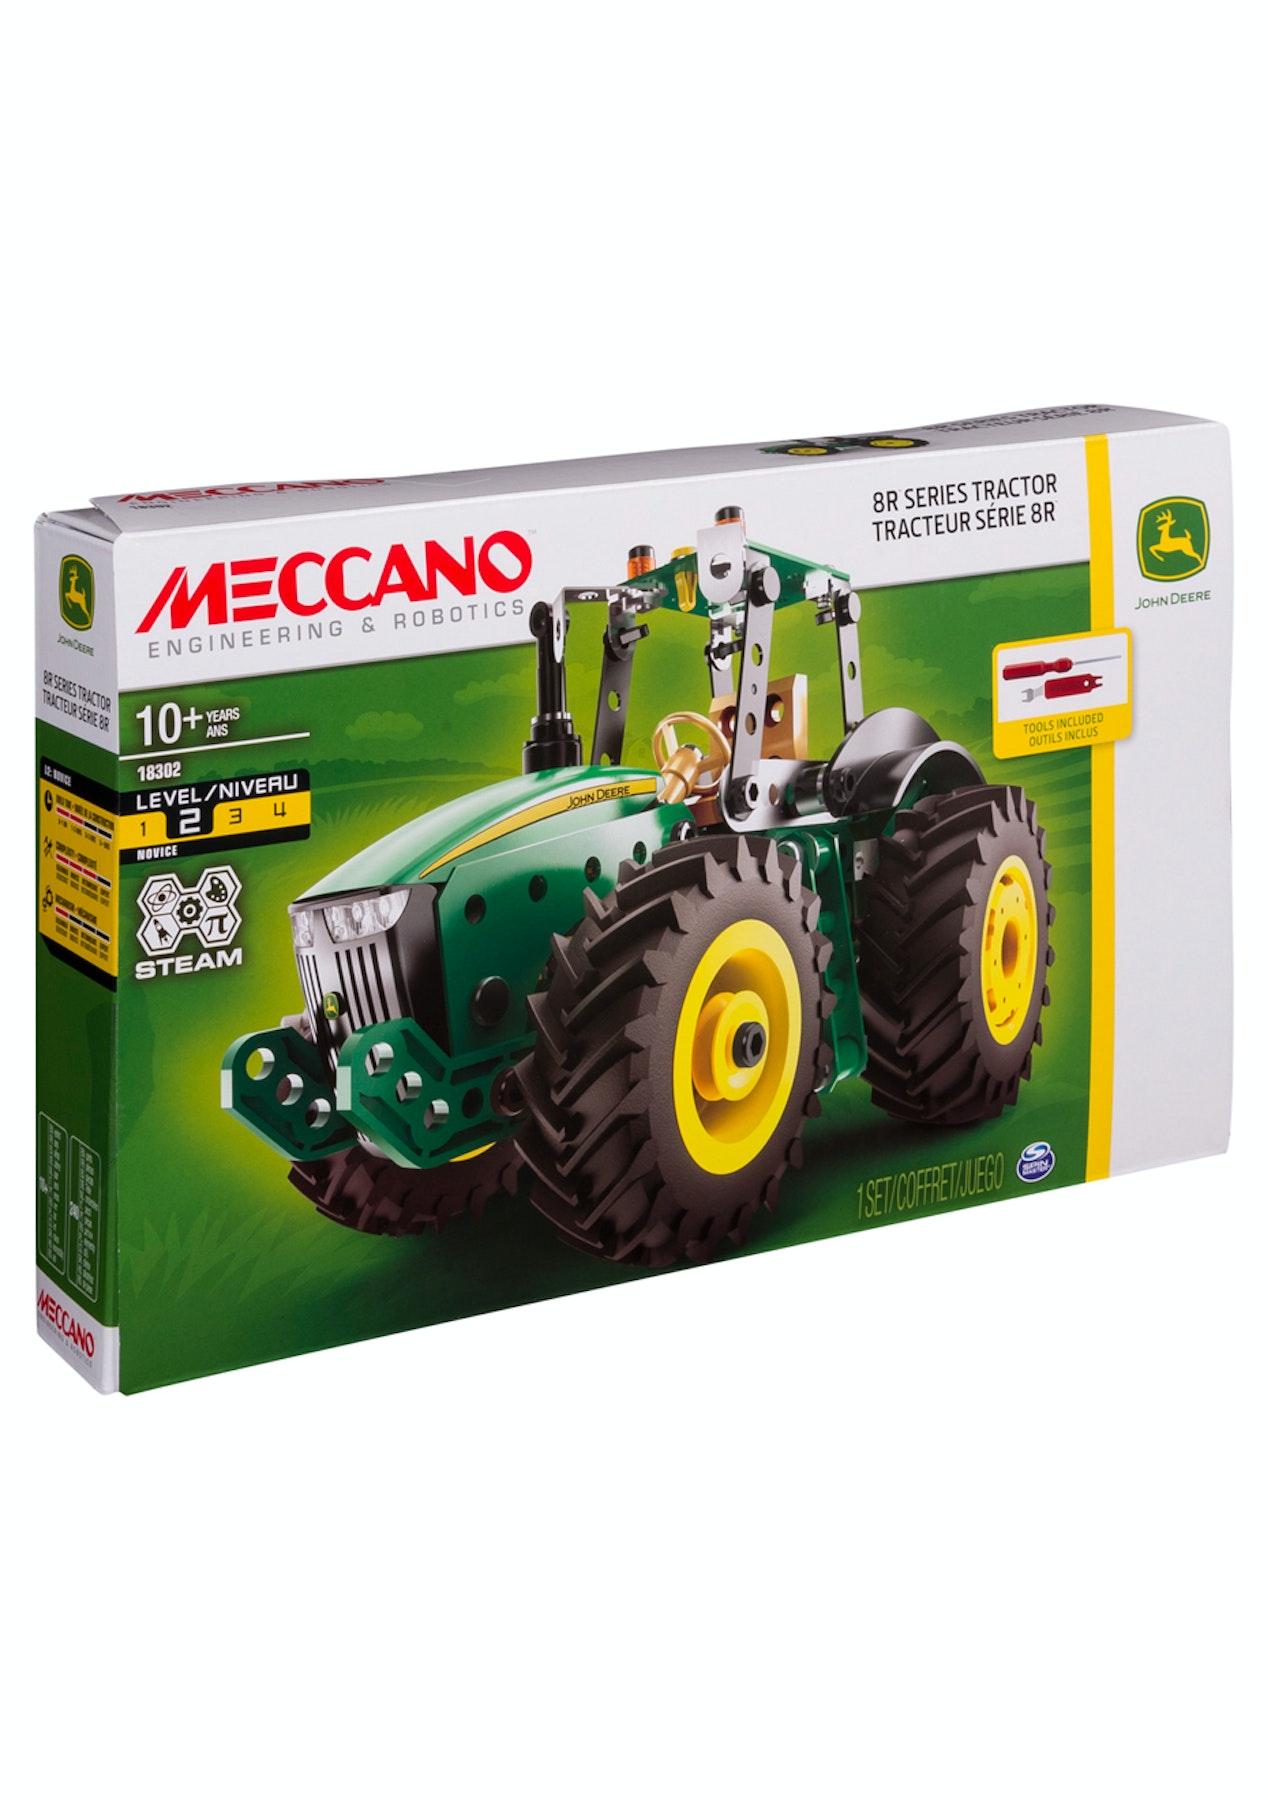 John Deere Gifts >> Meccano John Deere 9rt Tractor Gifts For Kids Onceit